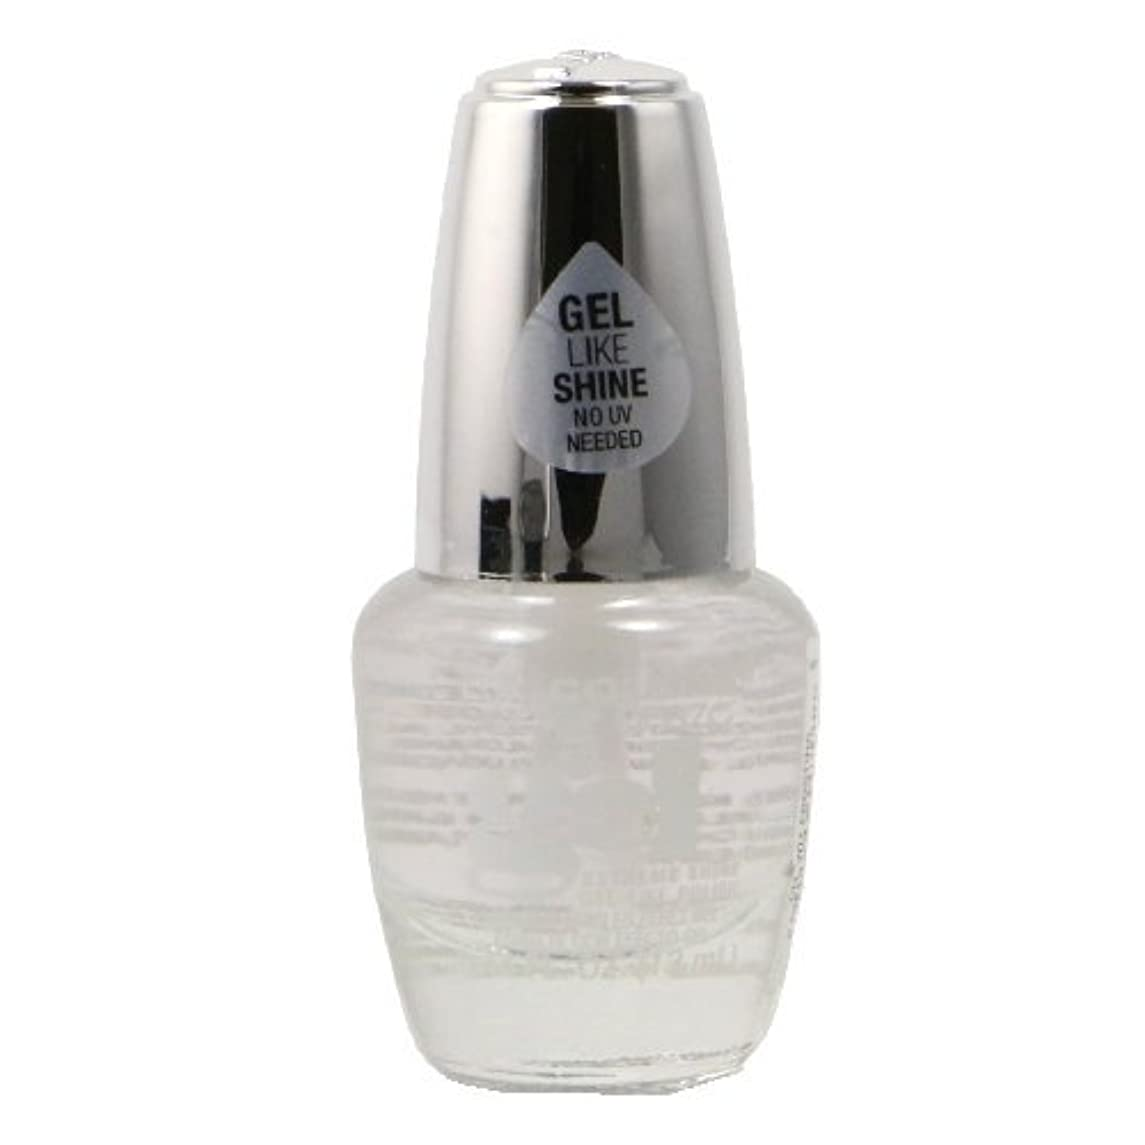 LA Colors 美容化粧品21 Cnp701美容化粧品21 0.44 fl。 oz。 (13ml) フロスティング(cnp701)